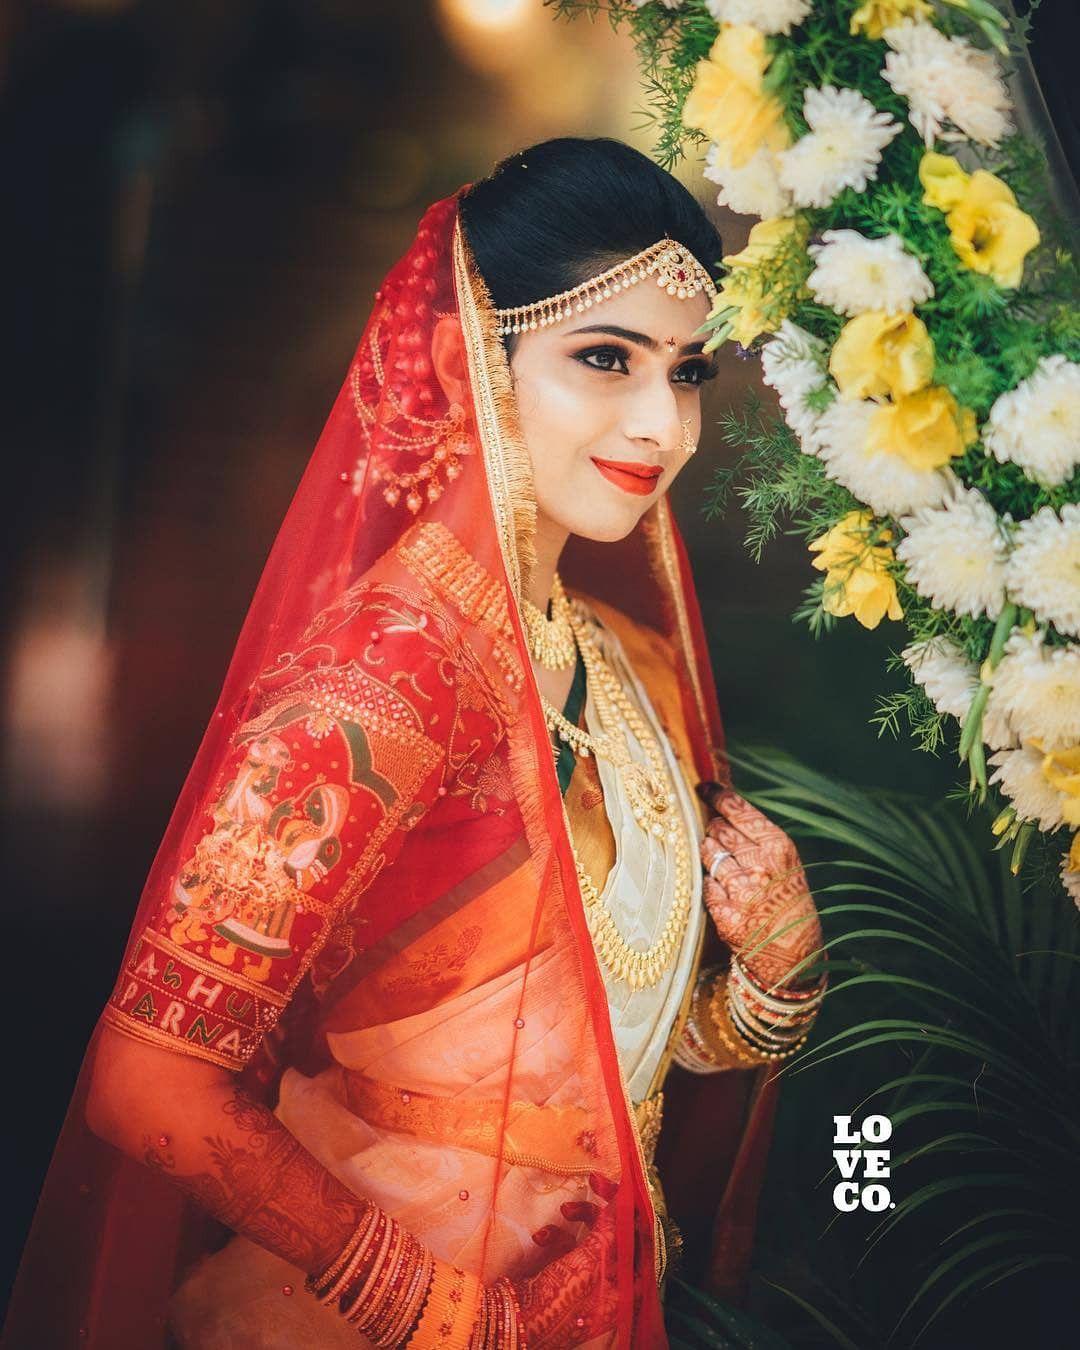 Pin By BridesEssentials On Brides Essentials Brides (With